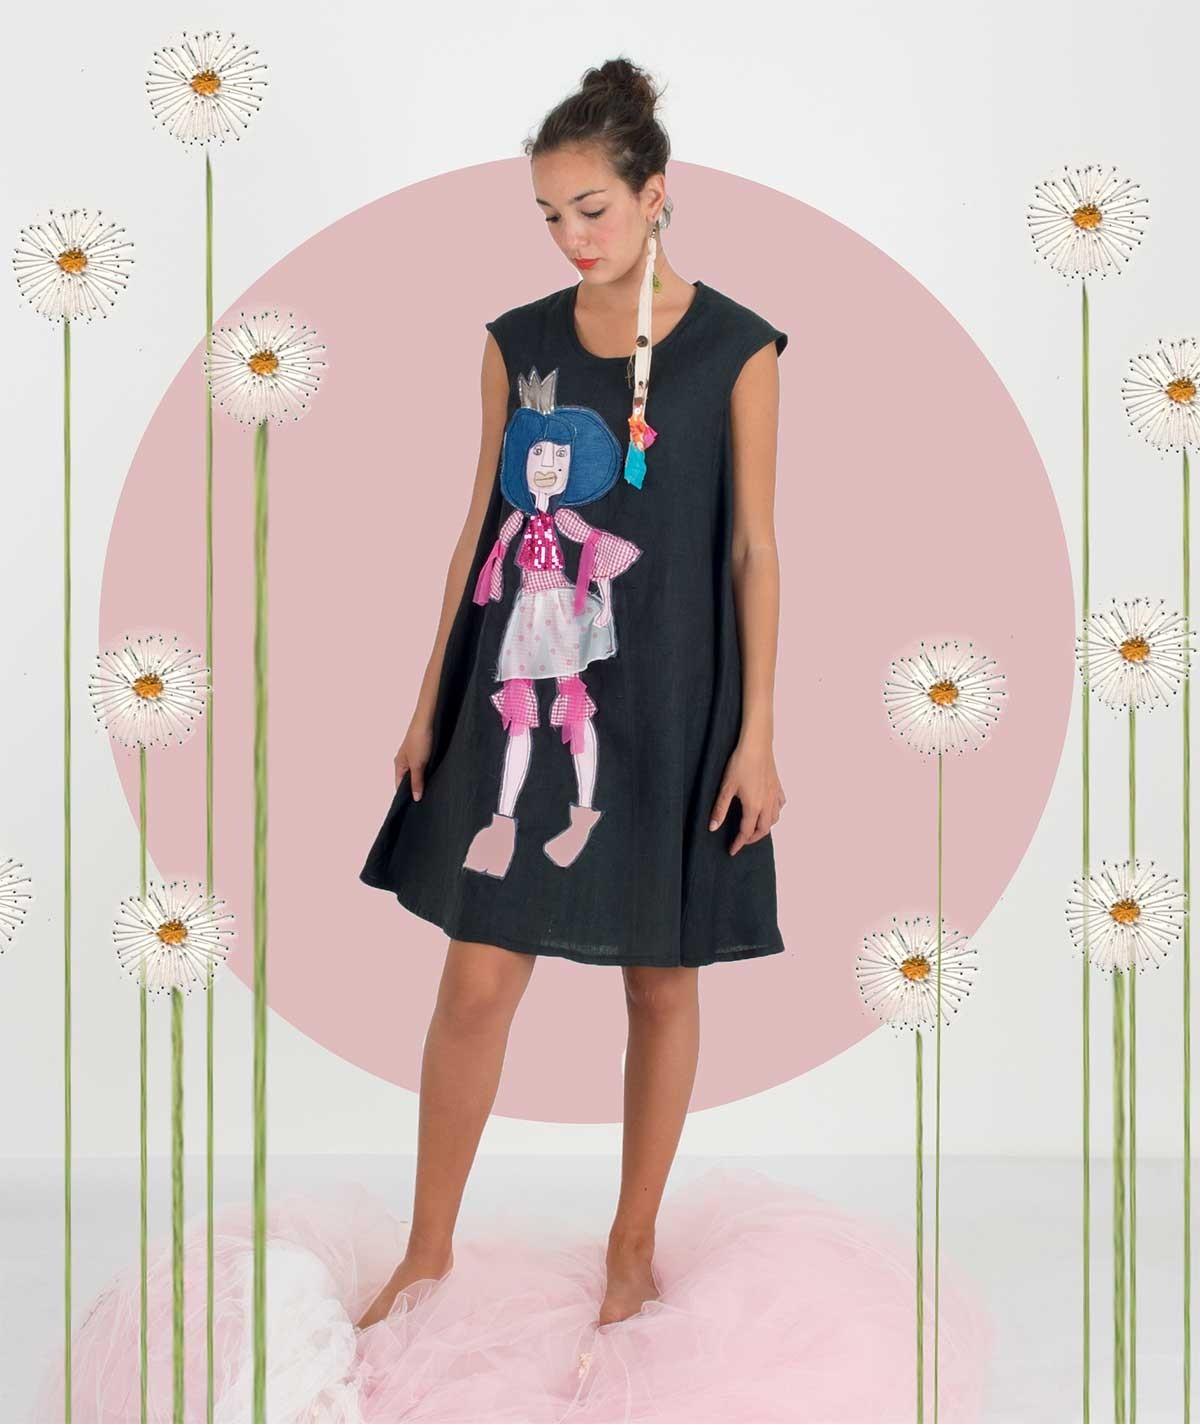 The fuchsia princess Dress